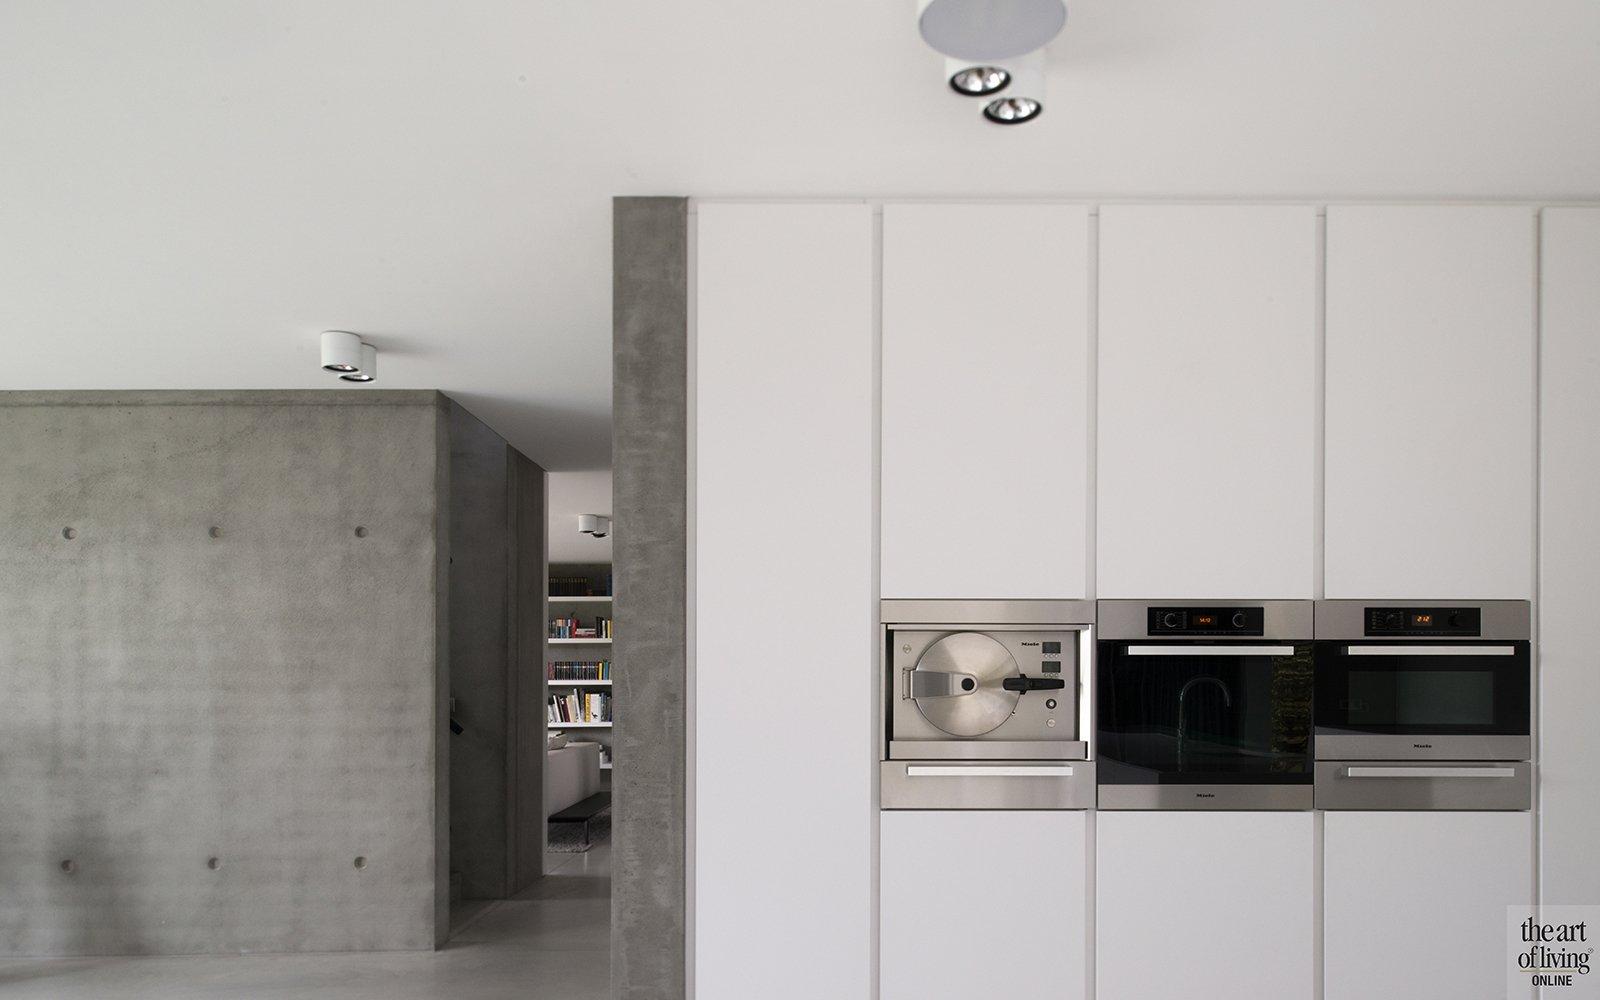 Keuken Beton Moderne : Complete betonlook pluspunt architectuur the art of living be